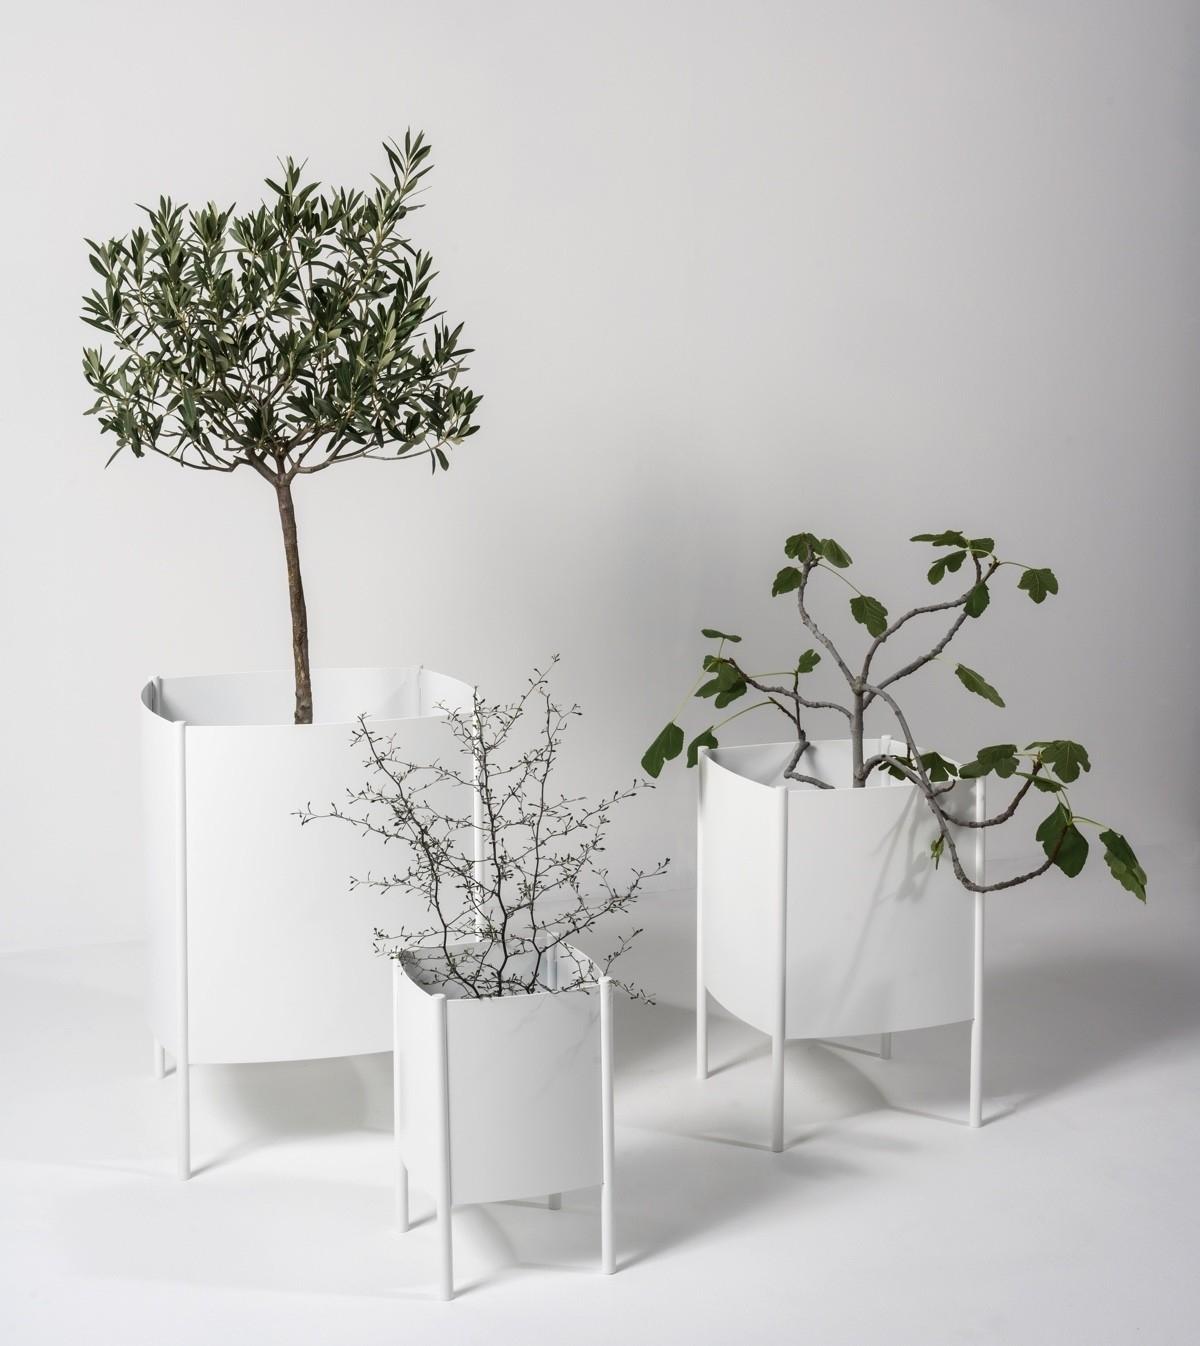 SMD Convex Planters